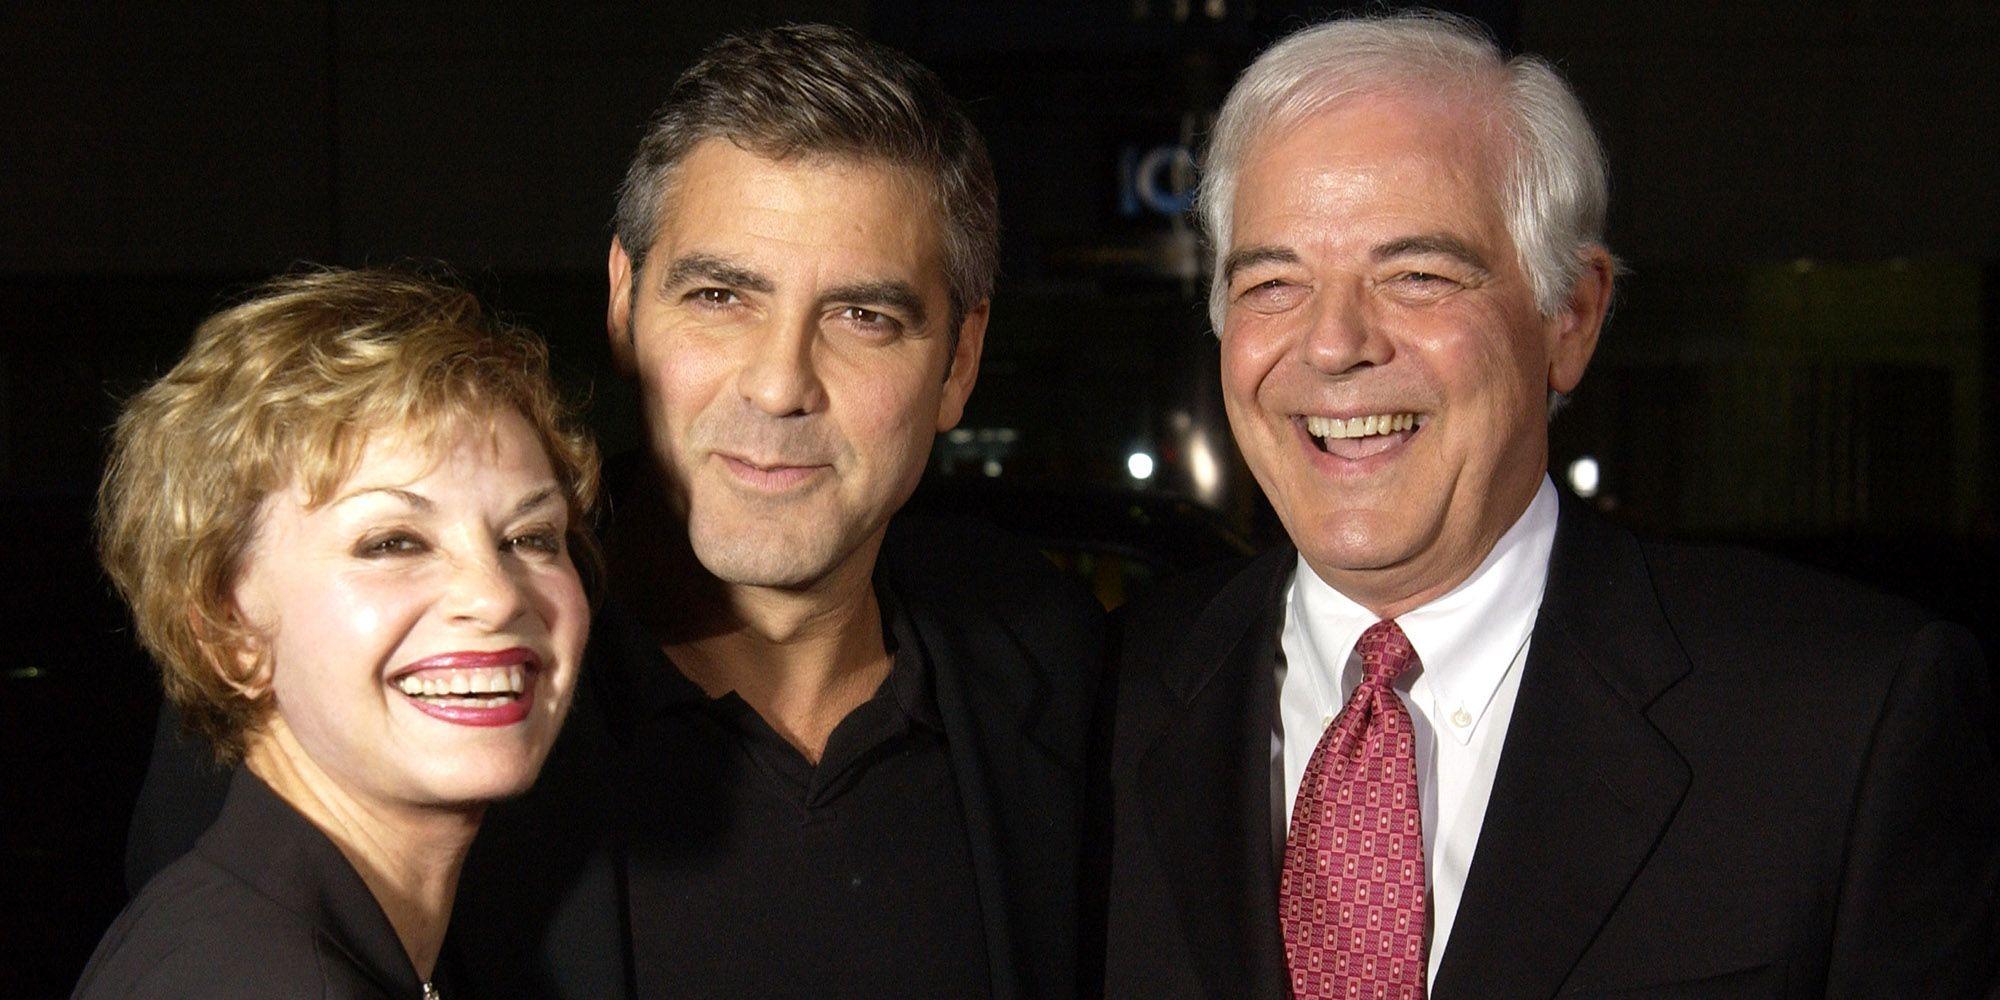 Nick Clooney anchorman